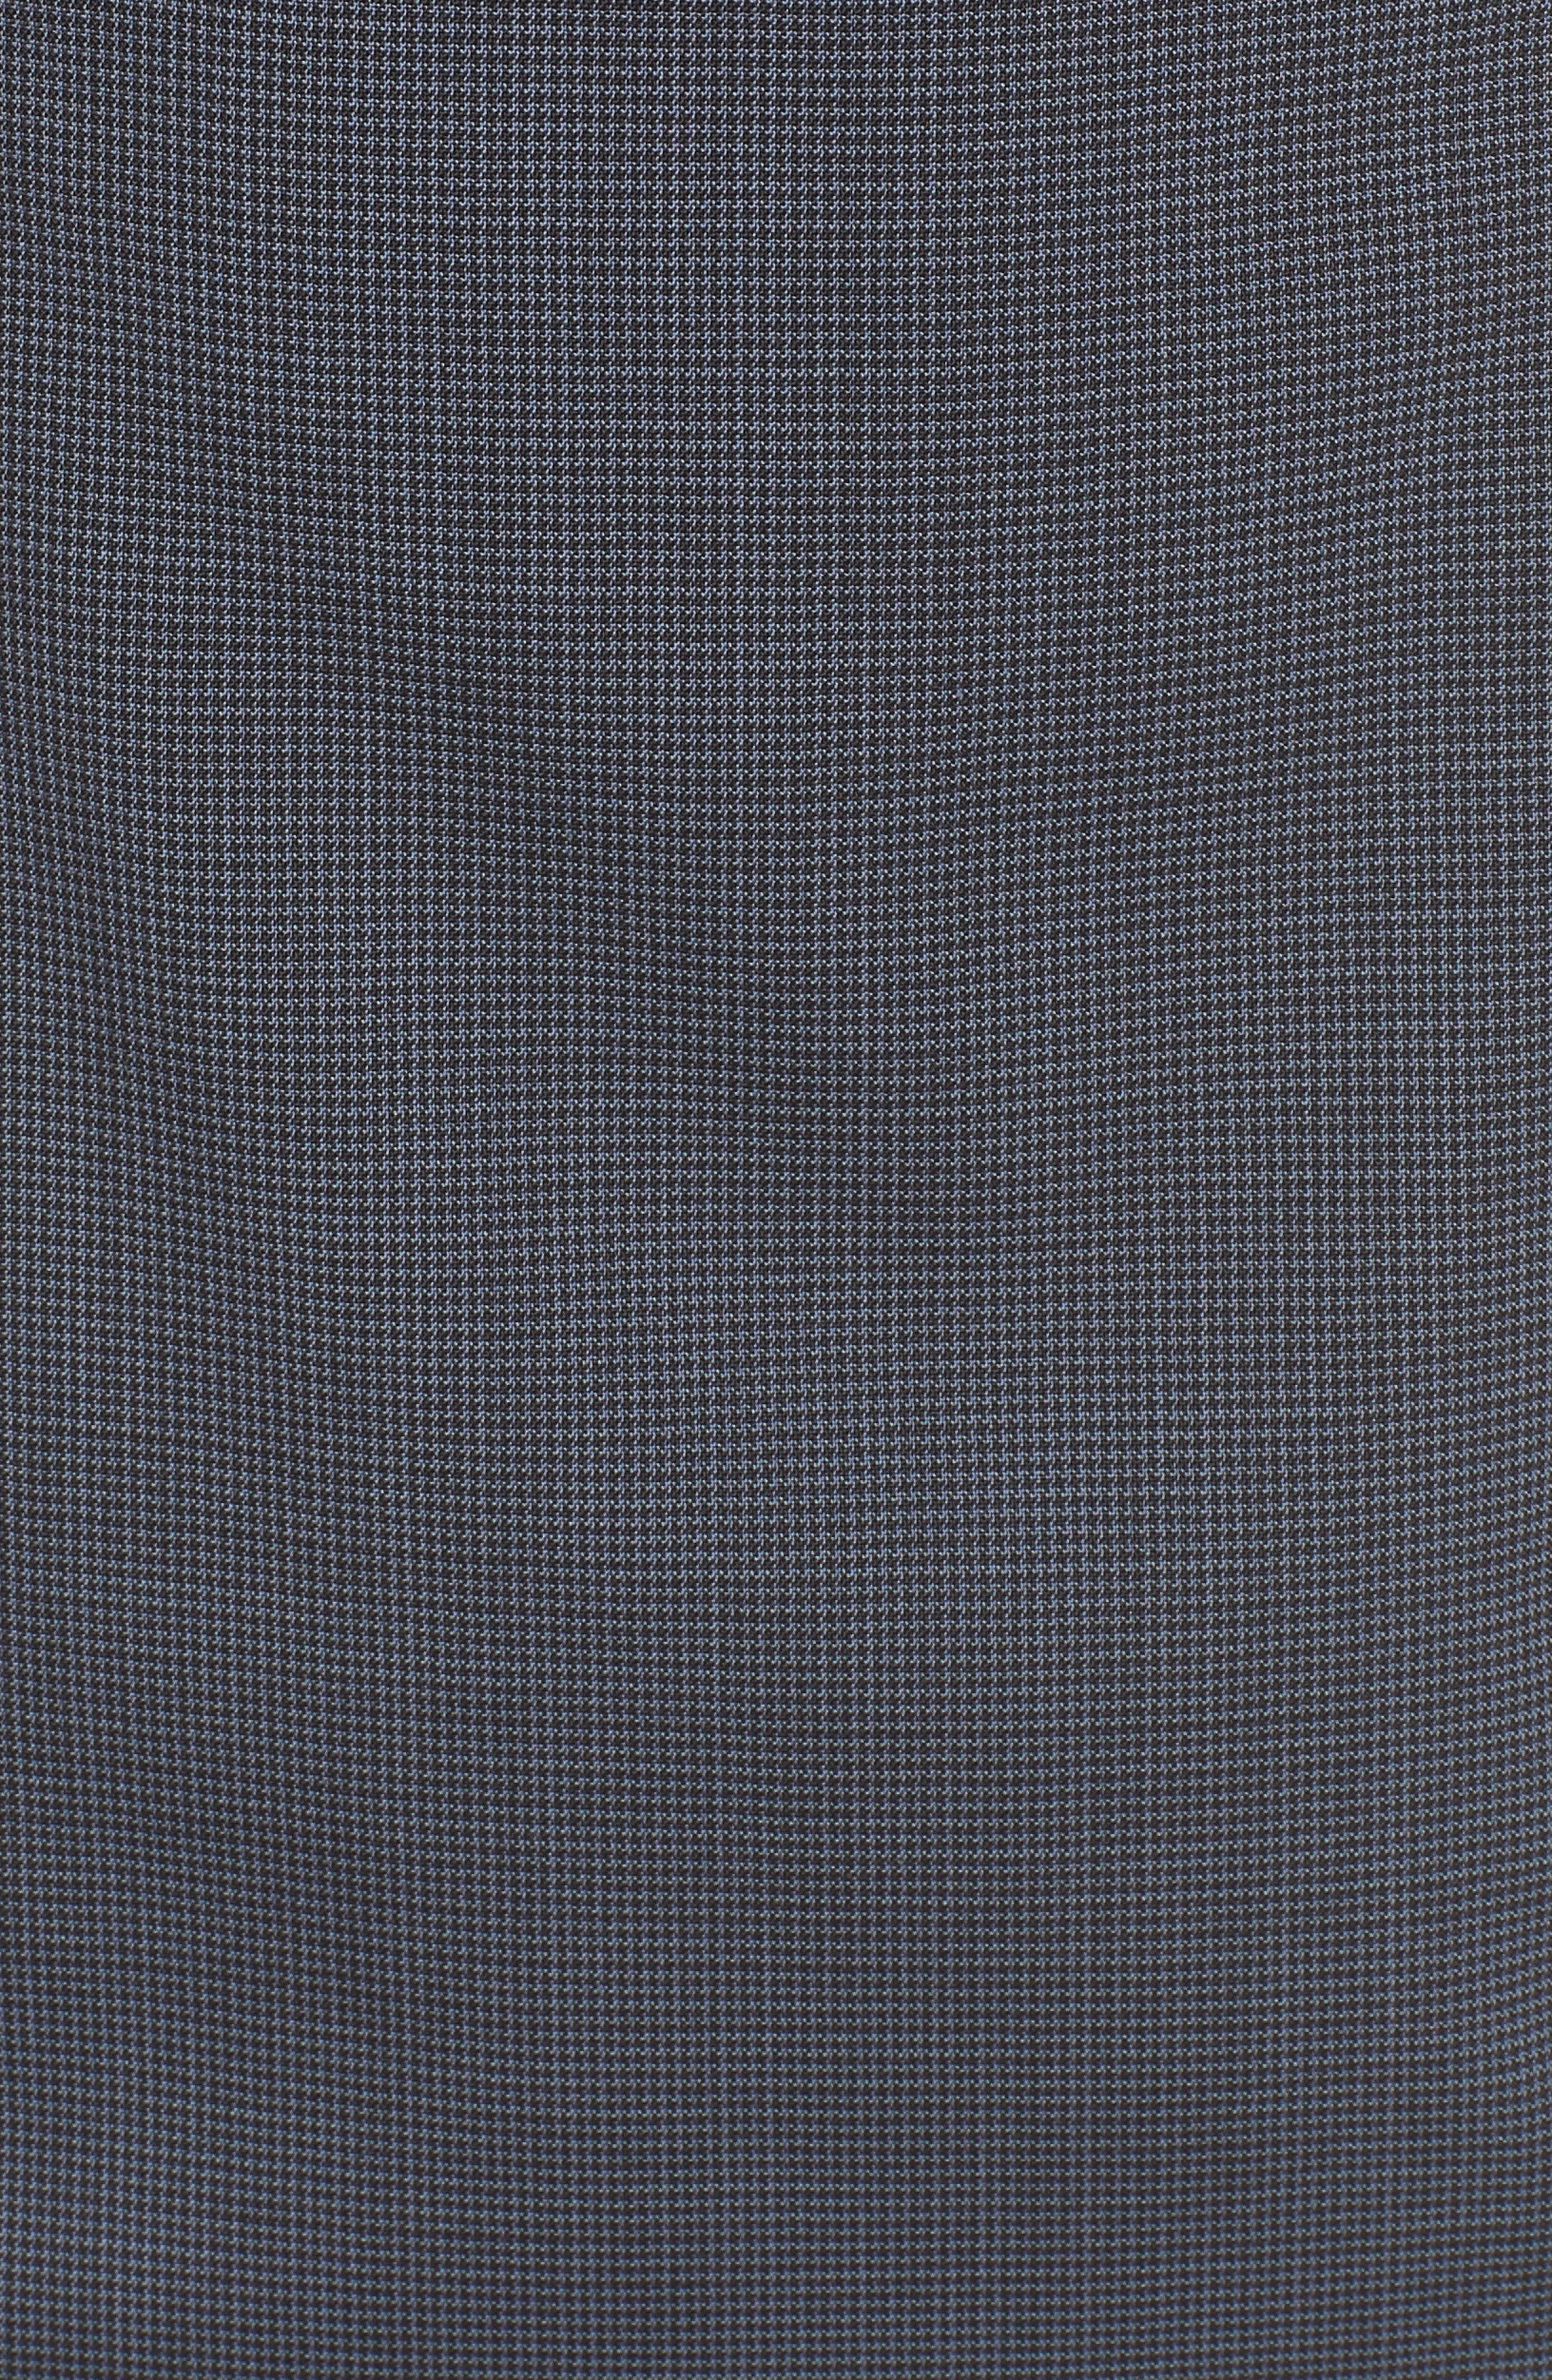 Dalouise Pepita Stretch Wool Sheath Dress,                             Alternate thumbnail 5, color,                             462